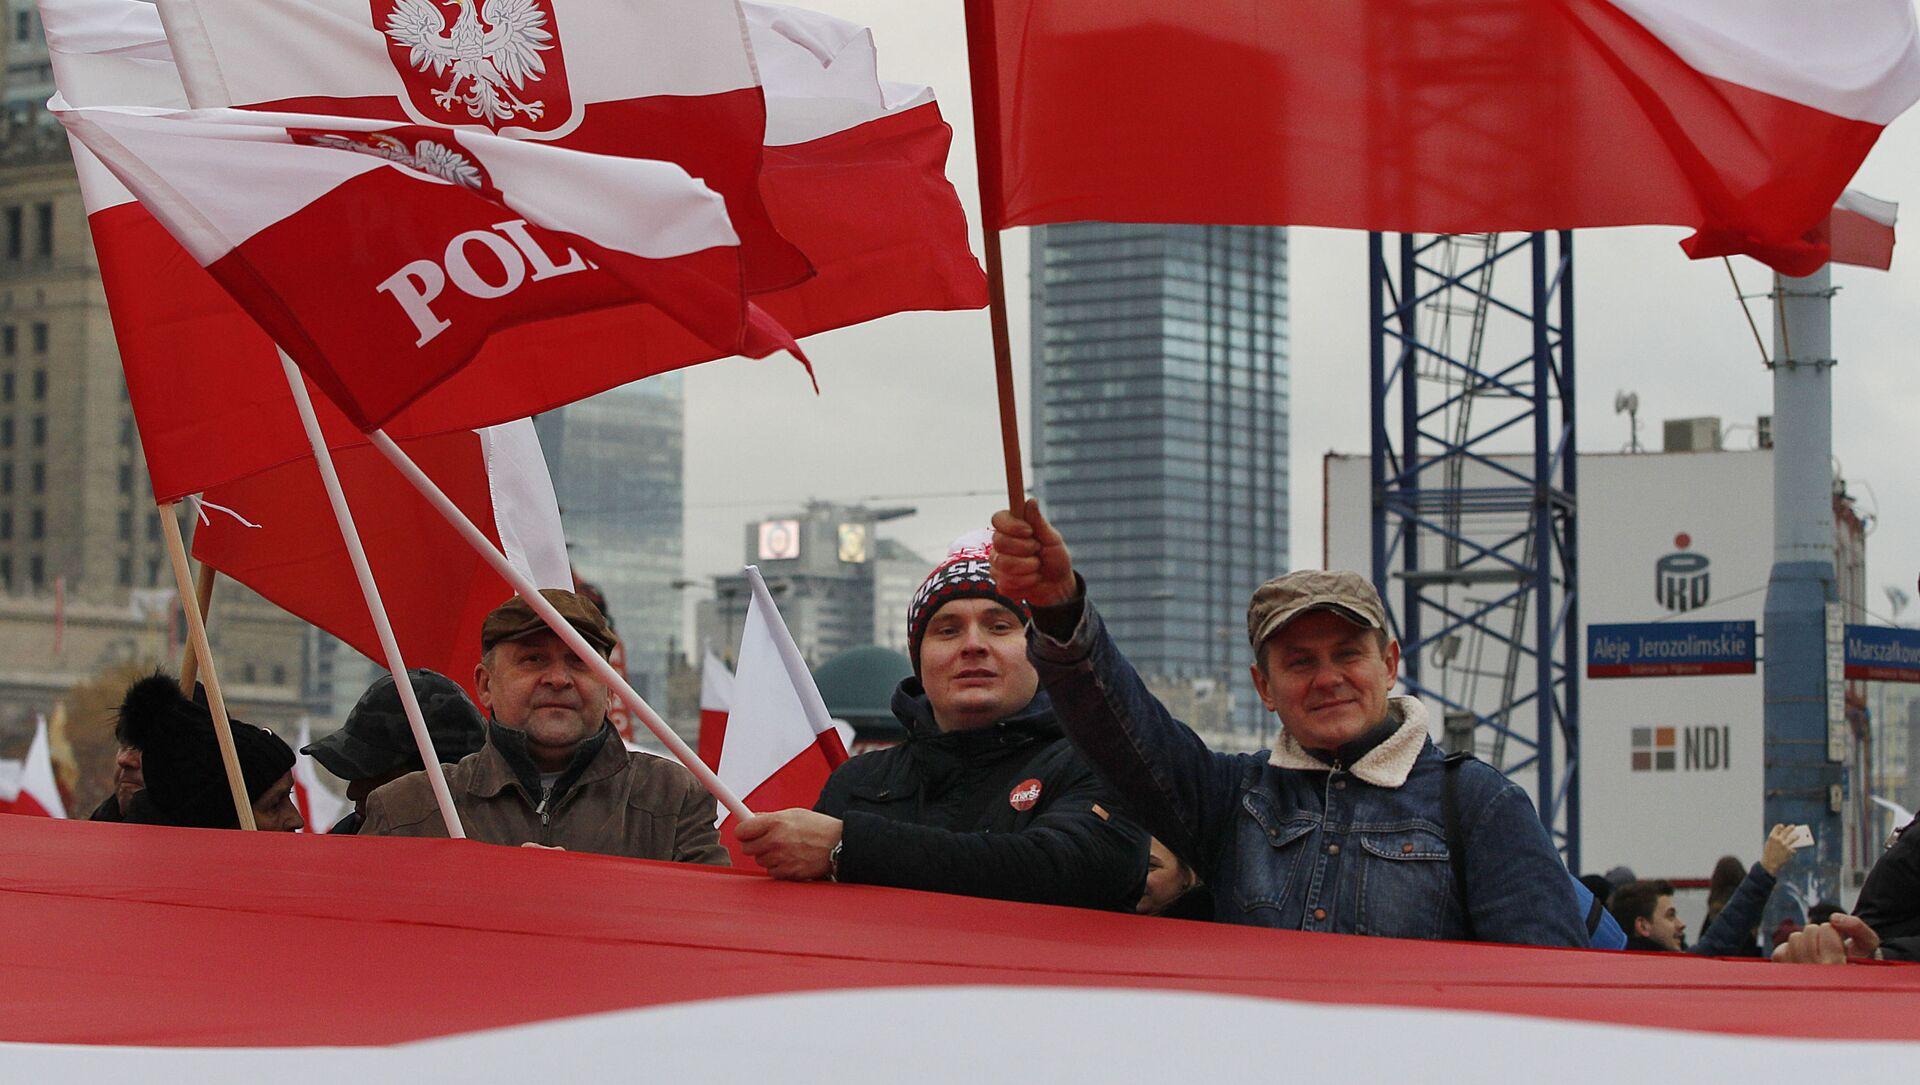 Polska flaga - Sputnik Polska, 1920, 25.03.2021